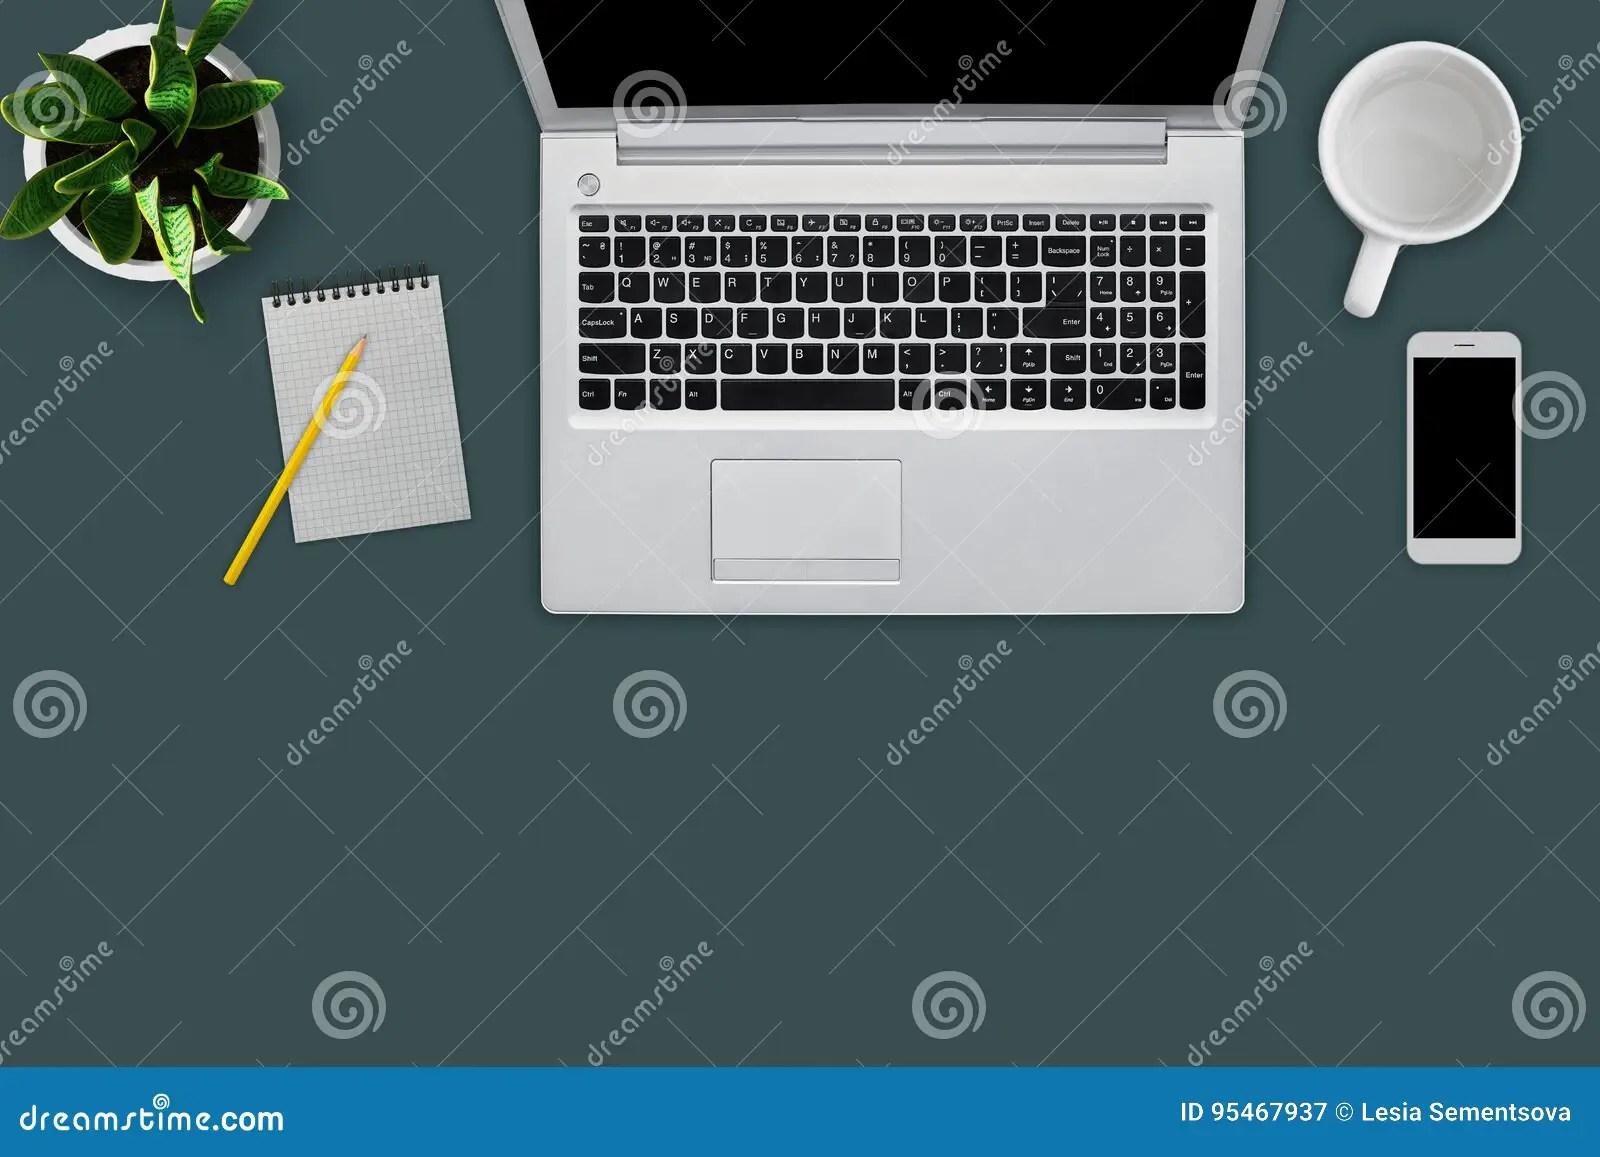 Modern Workplace With Digital Computer Cell Phone Mug